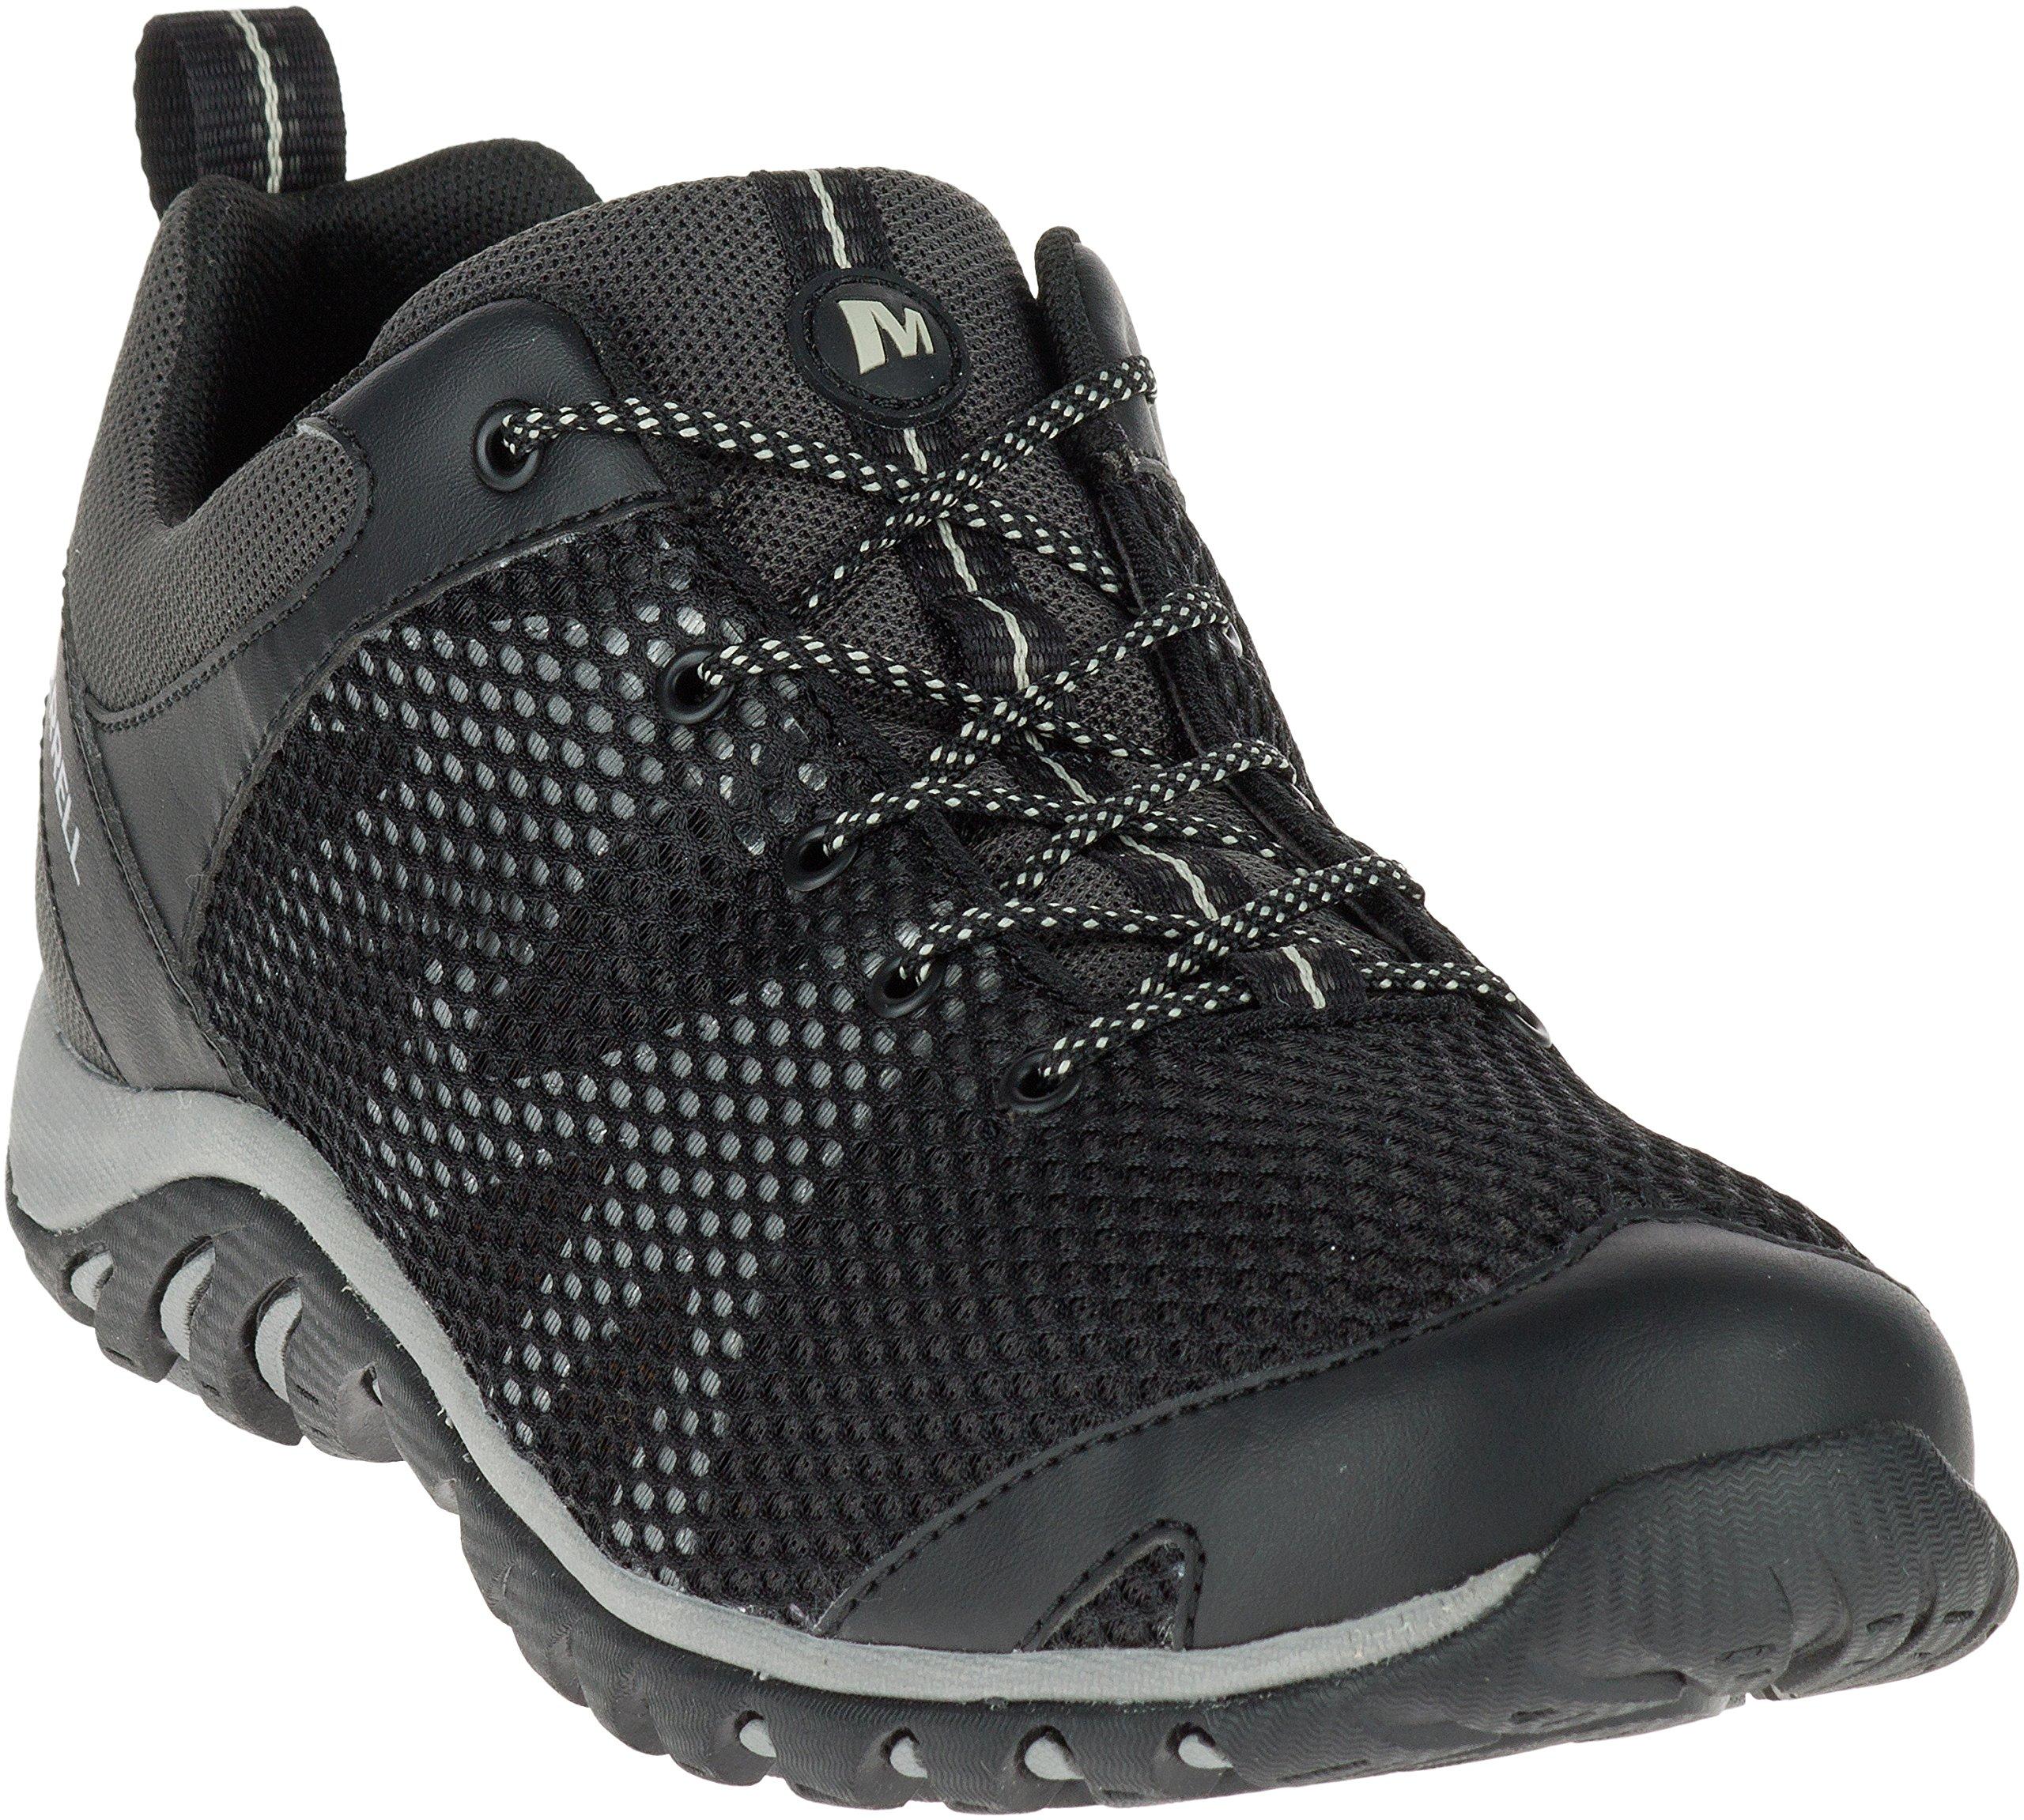 Merrell Rapidbow Men's Water Shoe 11 D(M) US Black/Ice